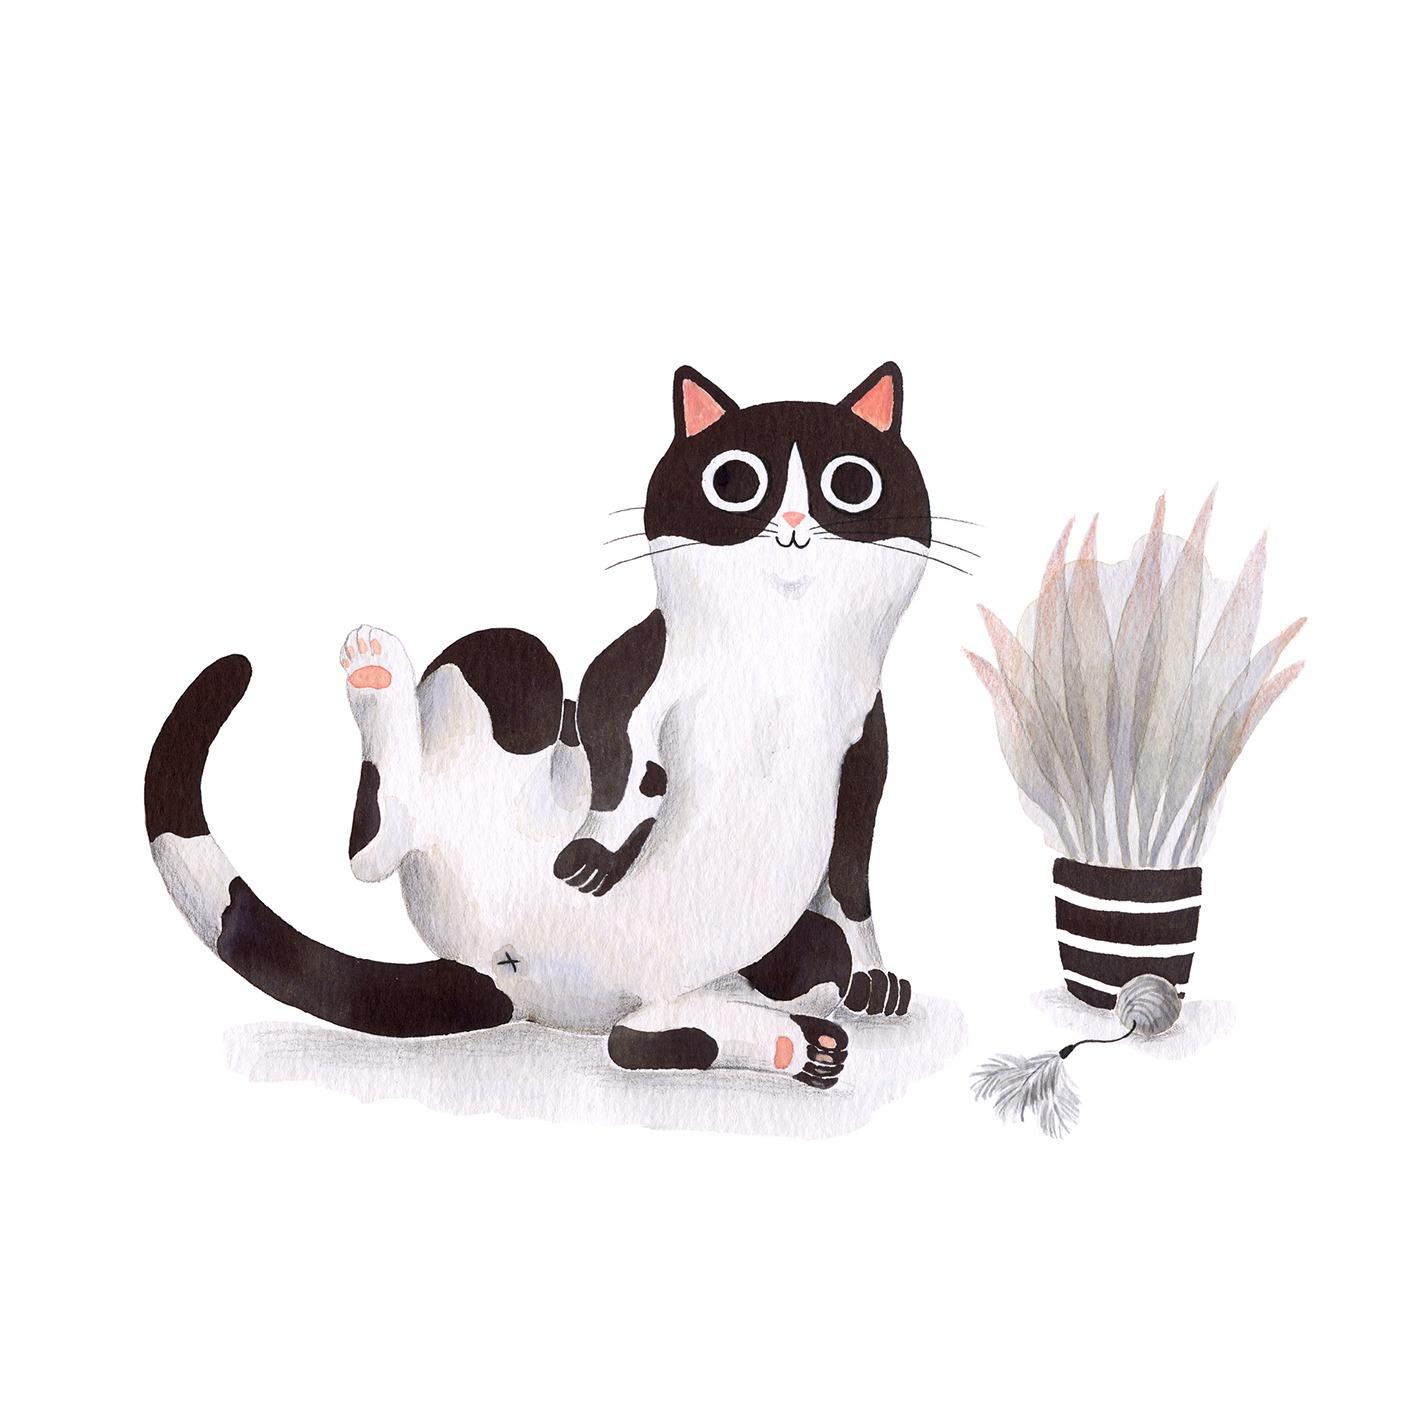 Ilustración de gato, Inktober, gato lavándose, retrato de gato